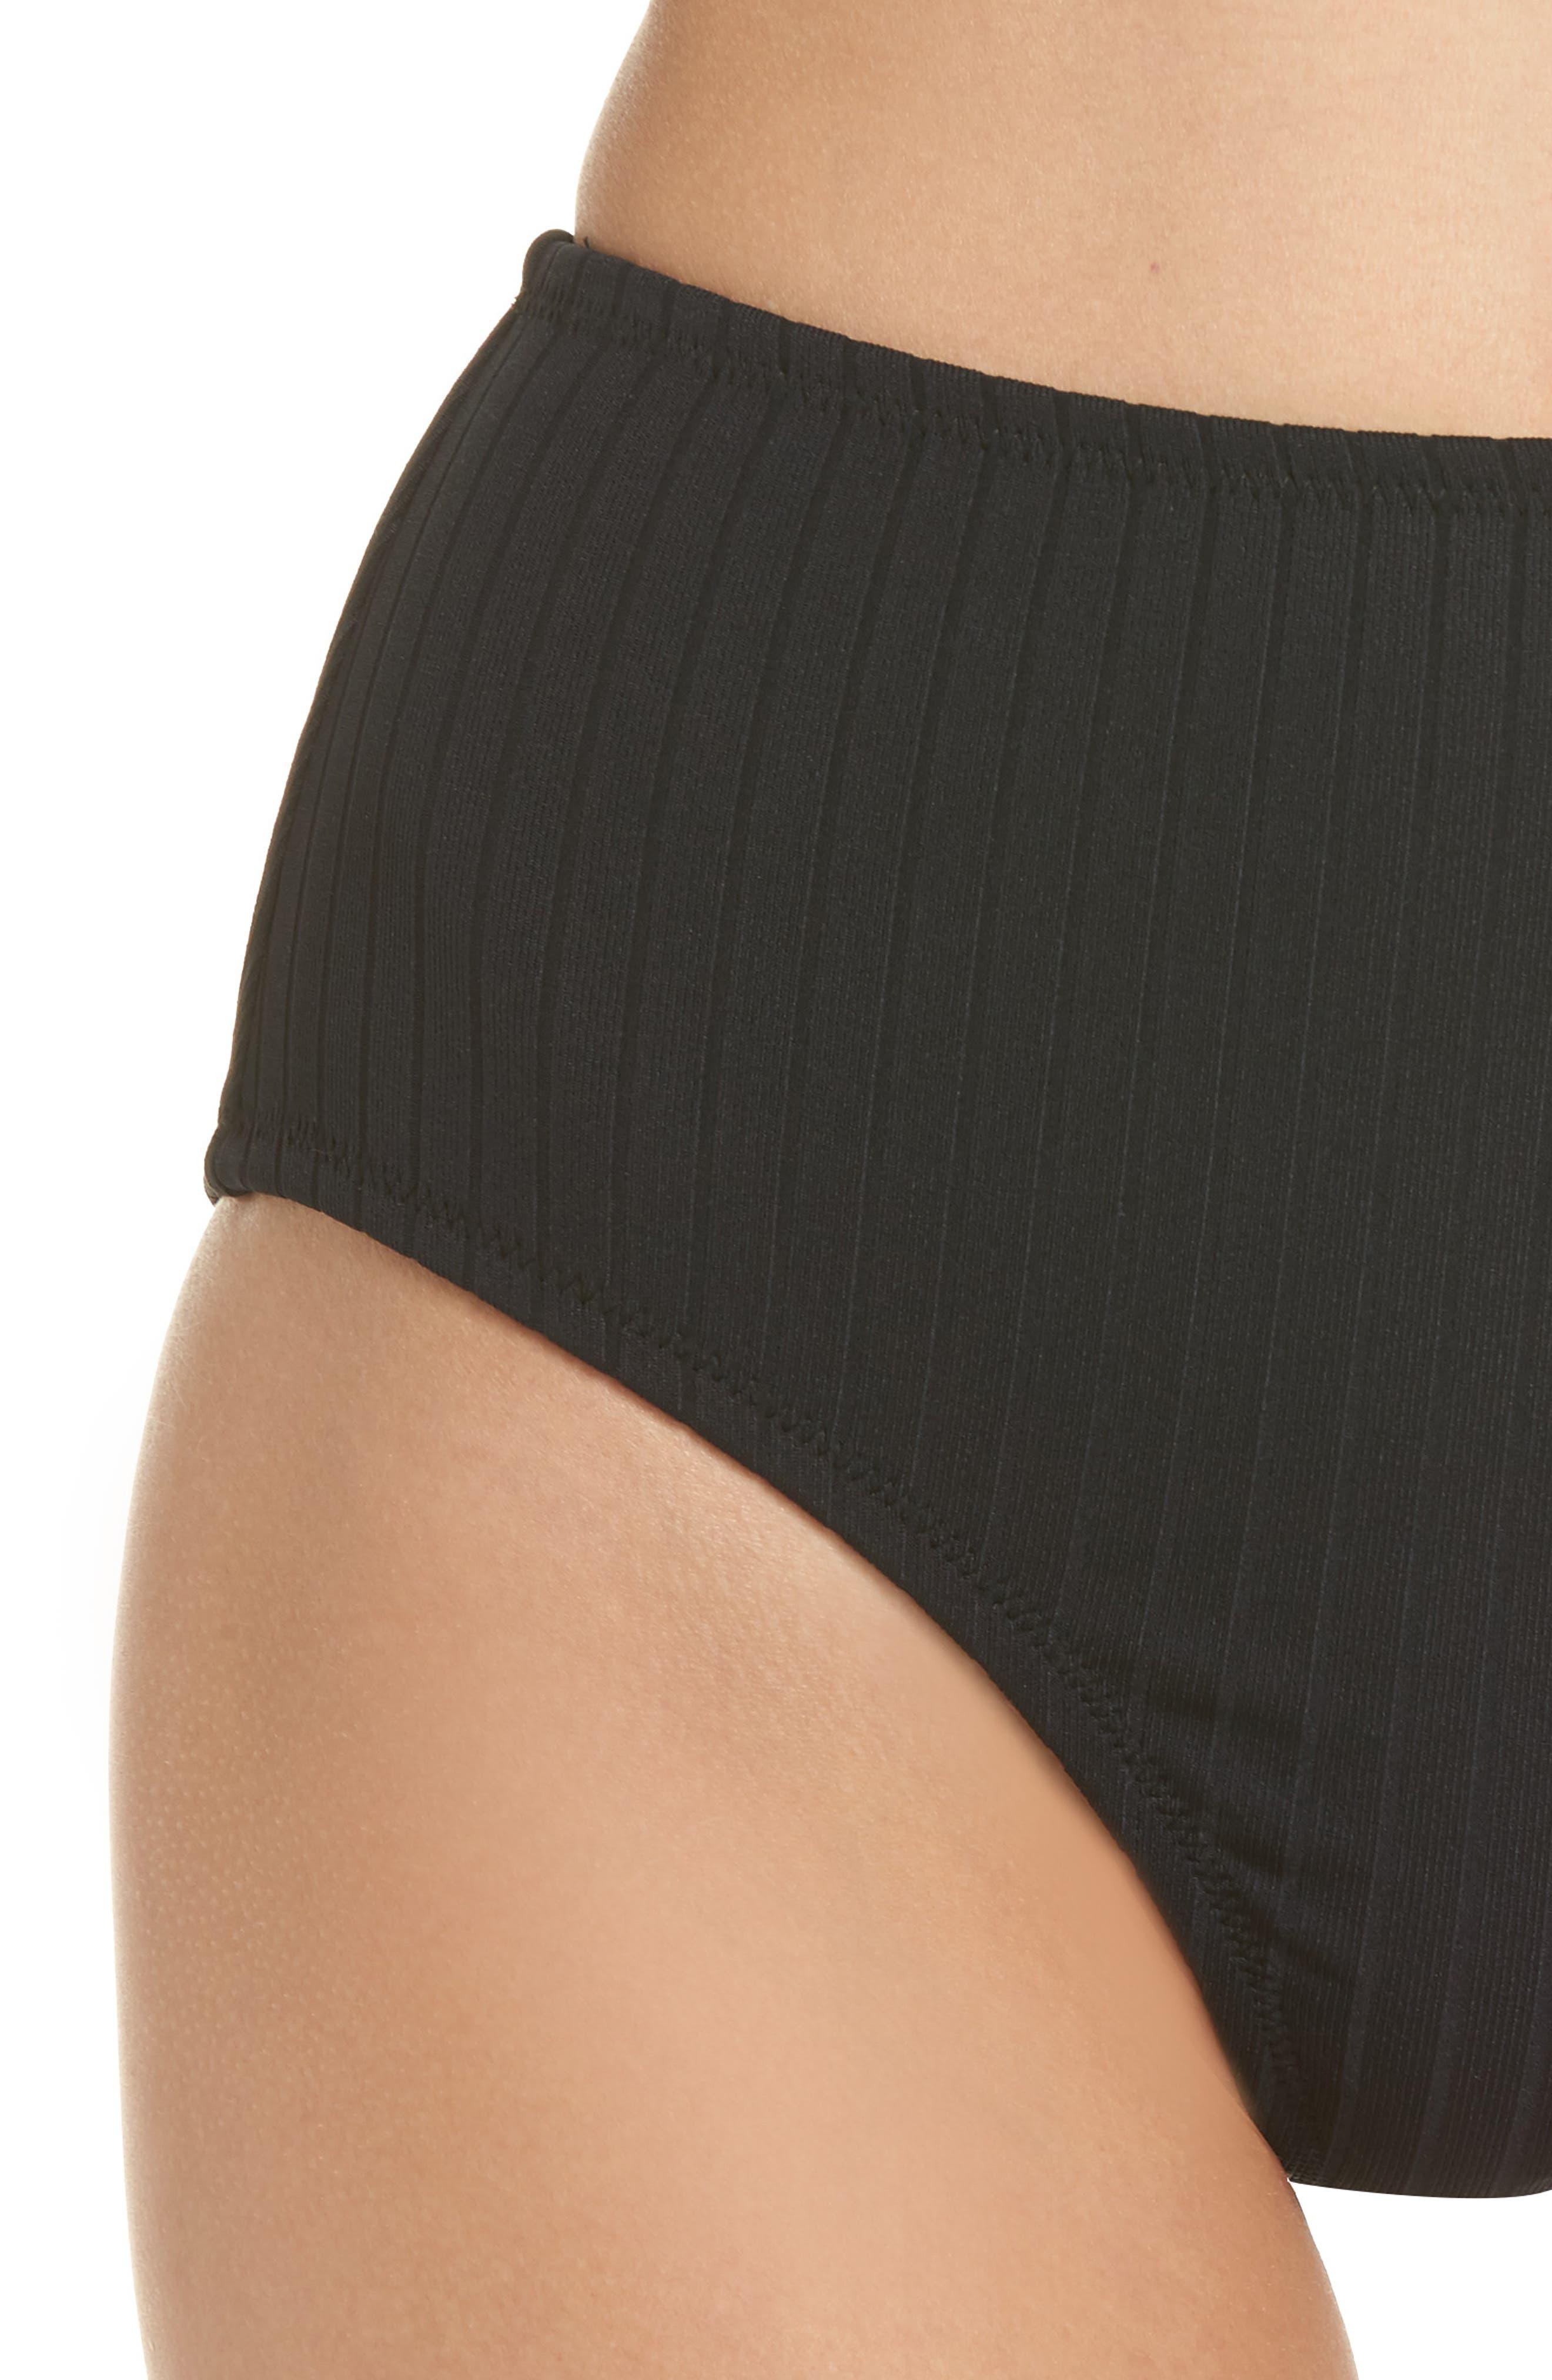 Westwood High Waist Bikini Bottoms,                             Alternate thumbnail 4, color,                             001